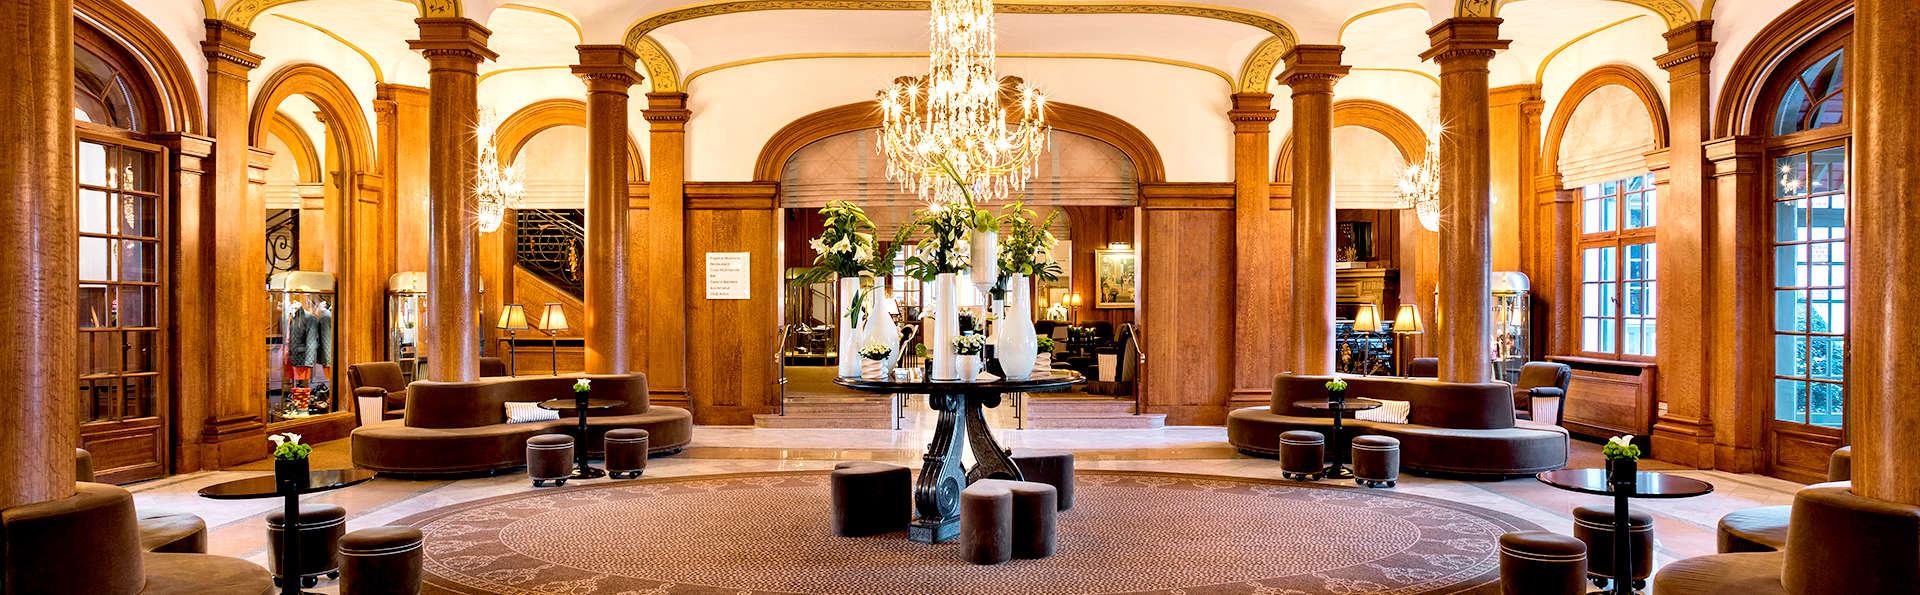 Hôtel Barrière Le Normandy Deauville - EDIT_NEW_LOBBY.jpg